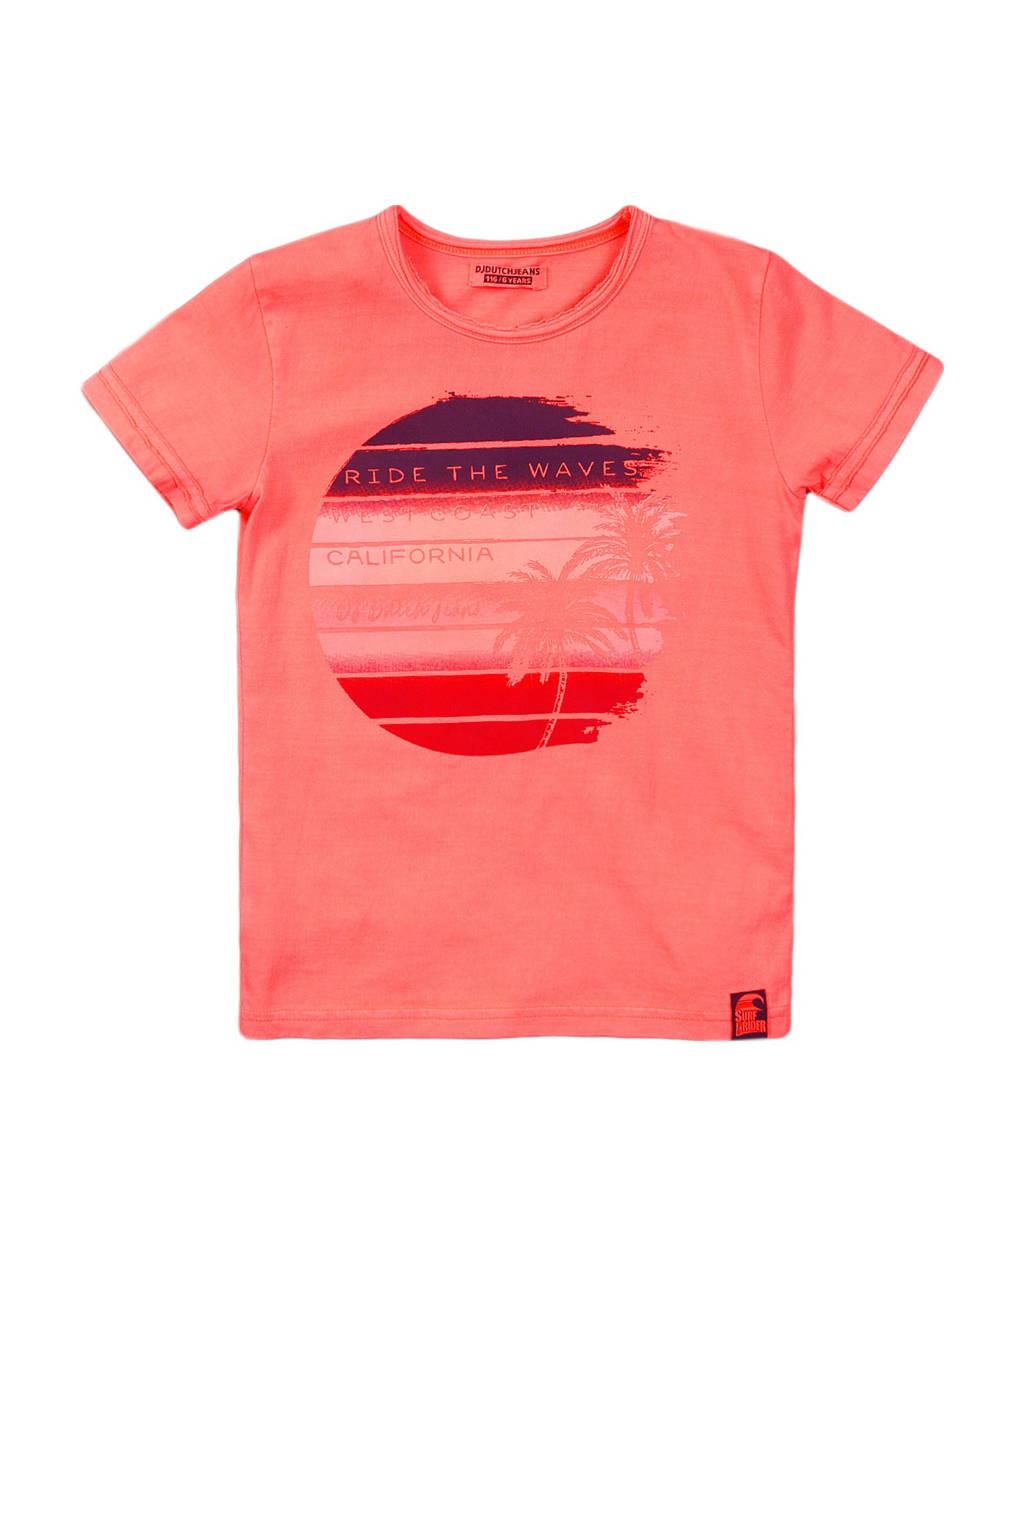 DJ Dutchjeans T-shirt met printopdruk koraalrood, Koraalrood